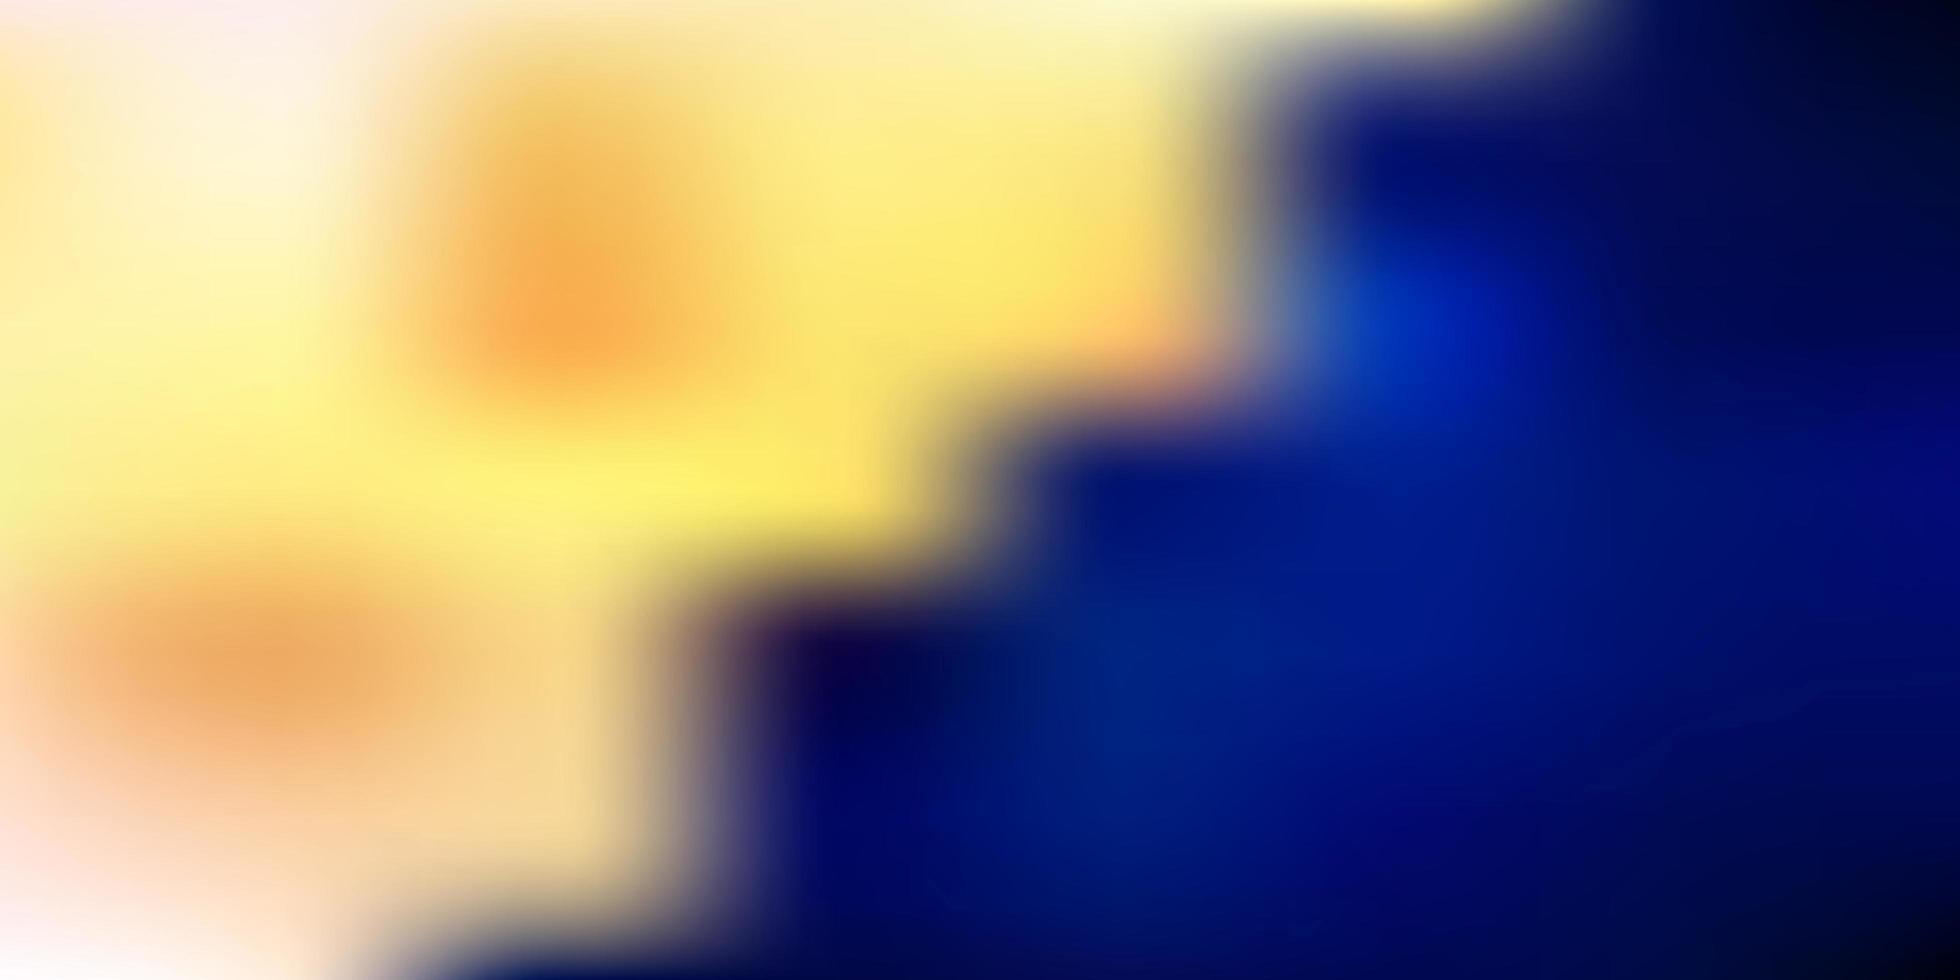 textura de desfoque gradiente de vetor azul escuro